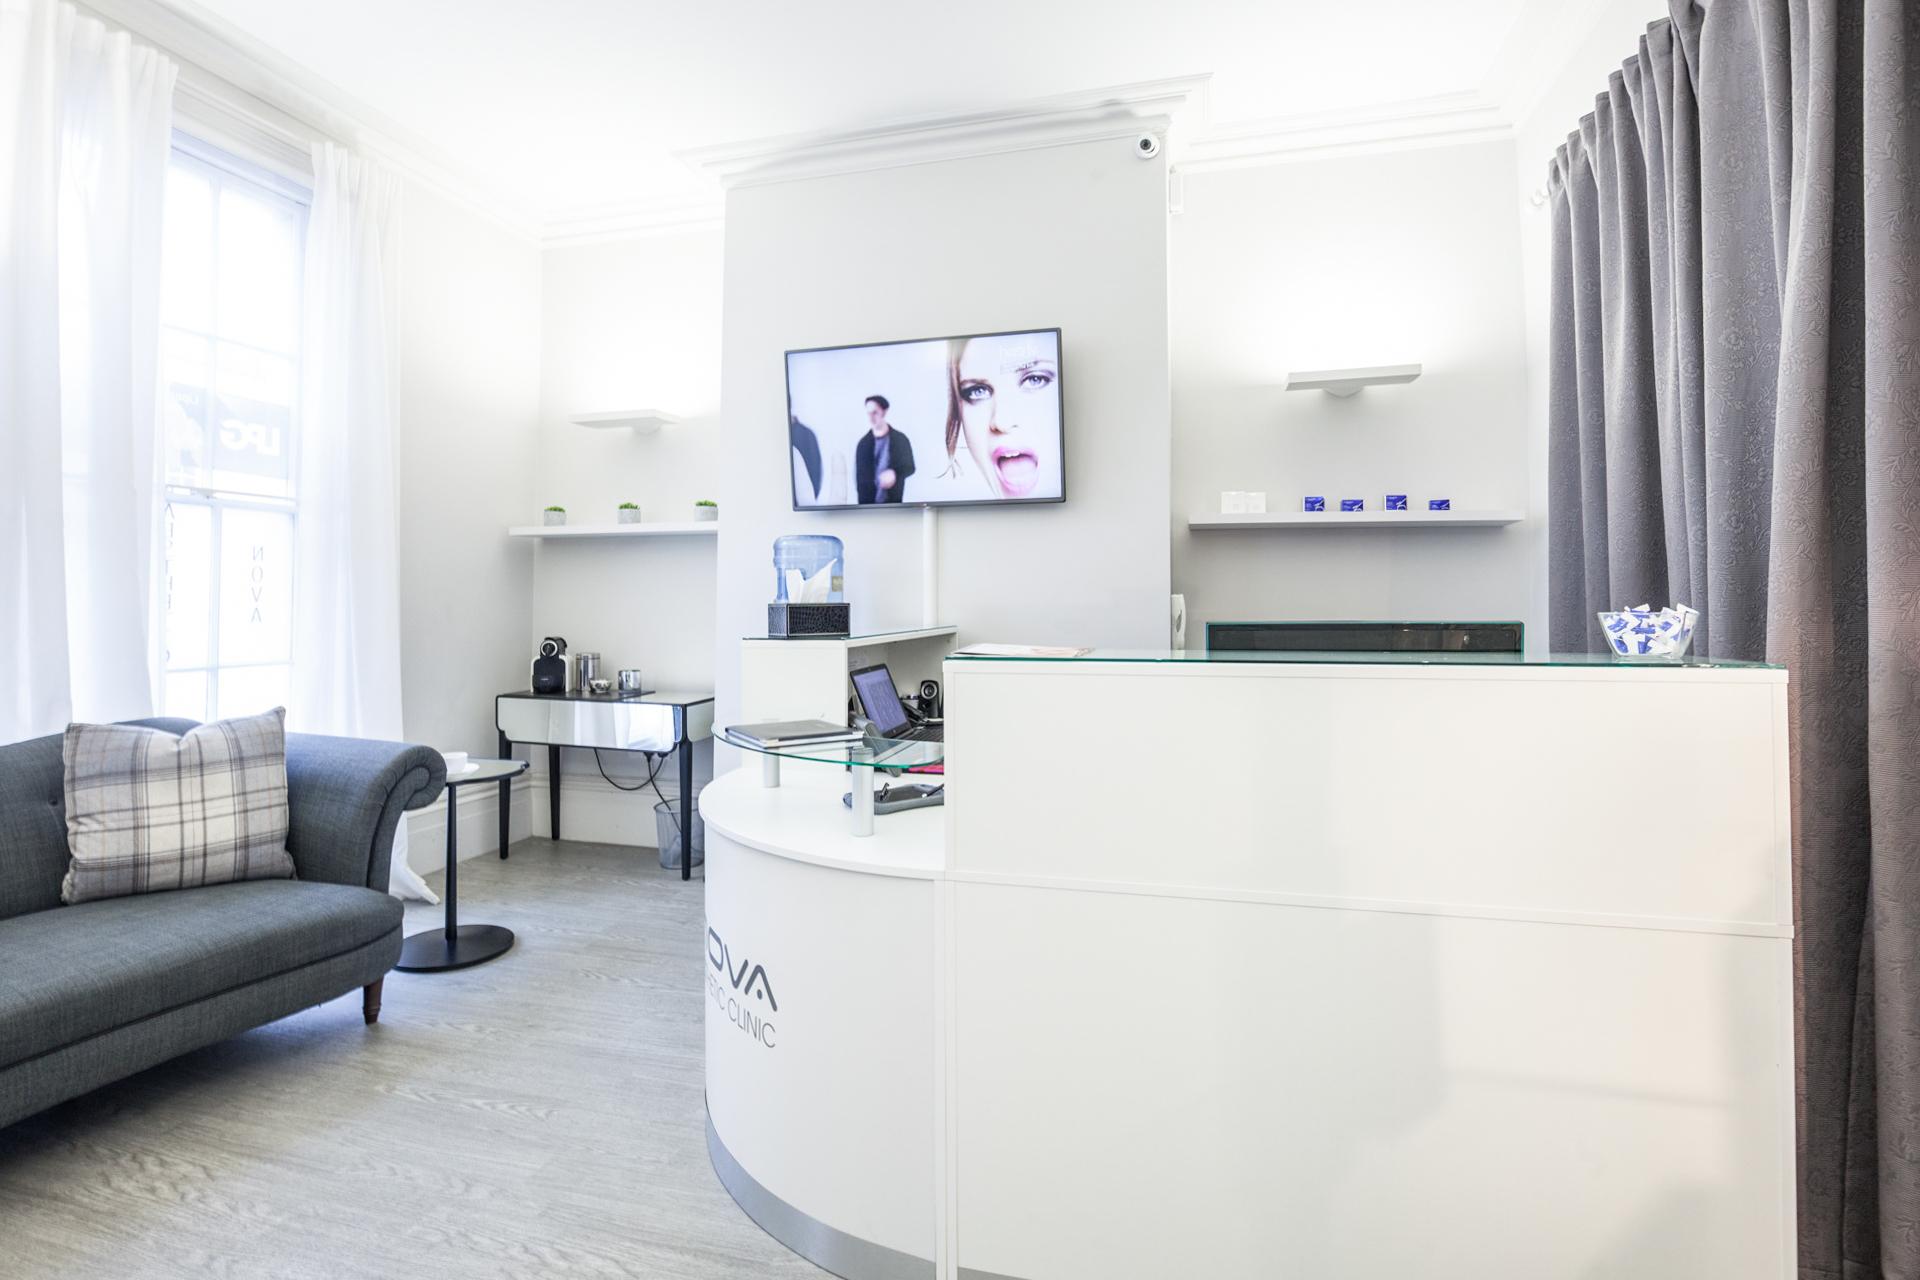 Nova_Aesthetic_Clinic_&_MediSpa_UKD_4.jpg